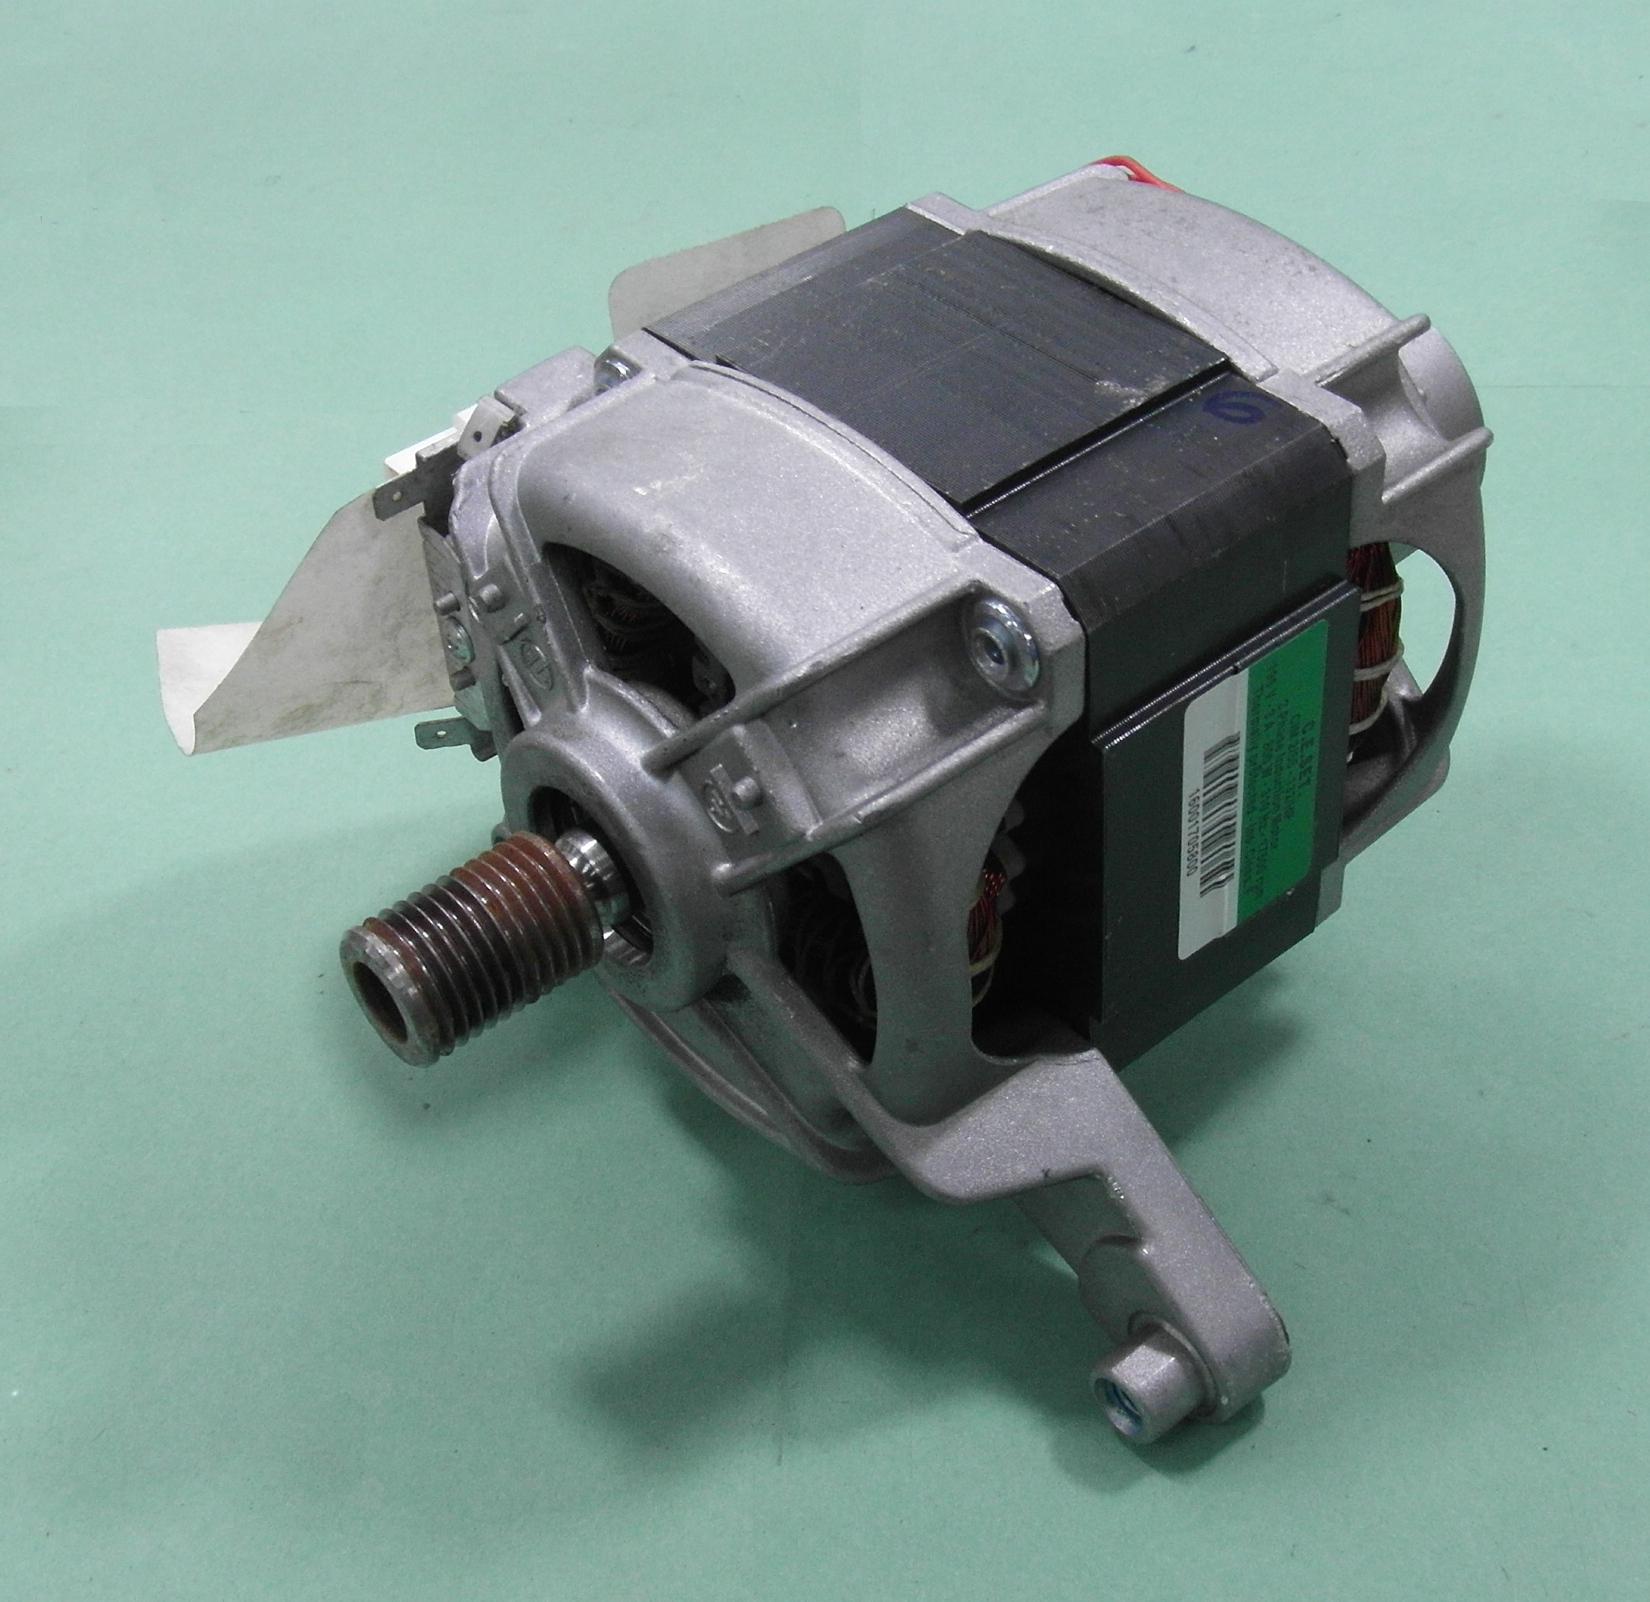 Hotpoint Wd640 Washer Dryer C E Set Motor Cim 2 55 132 Hp